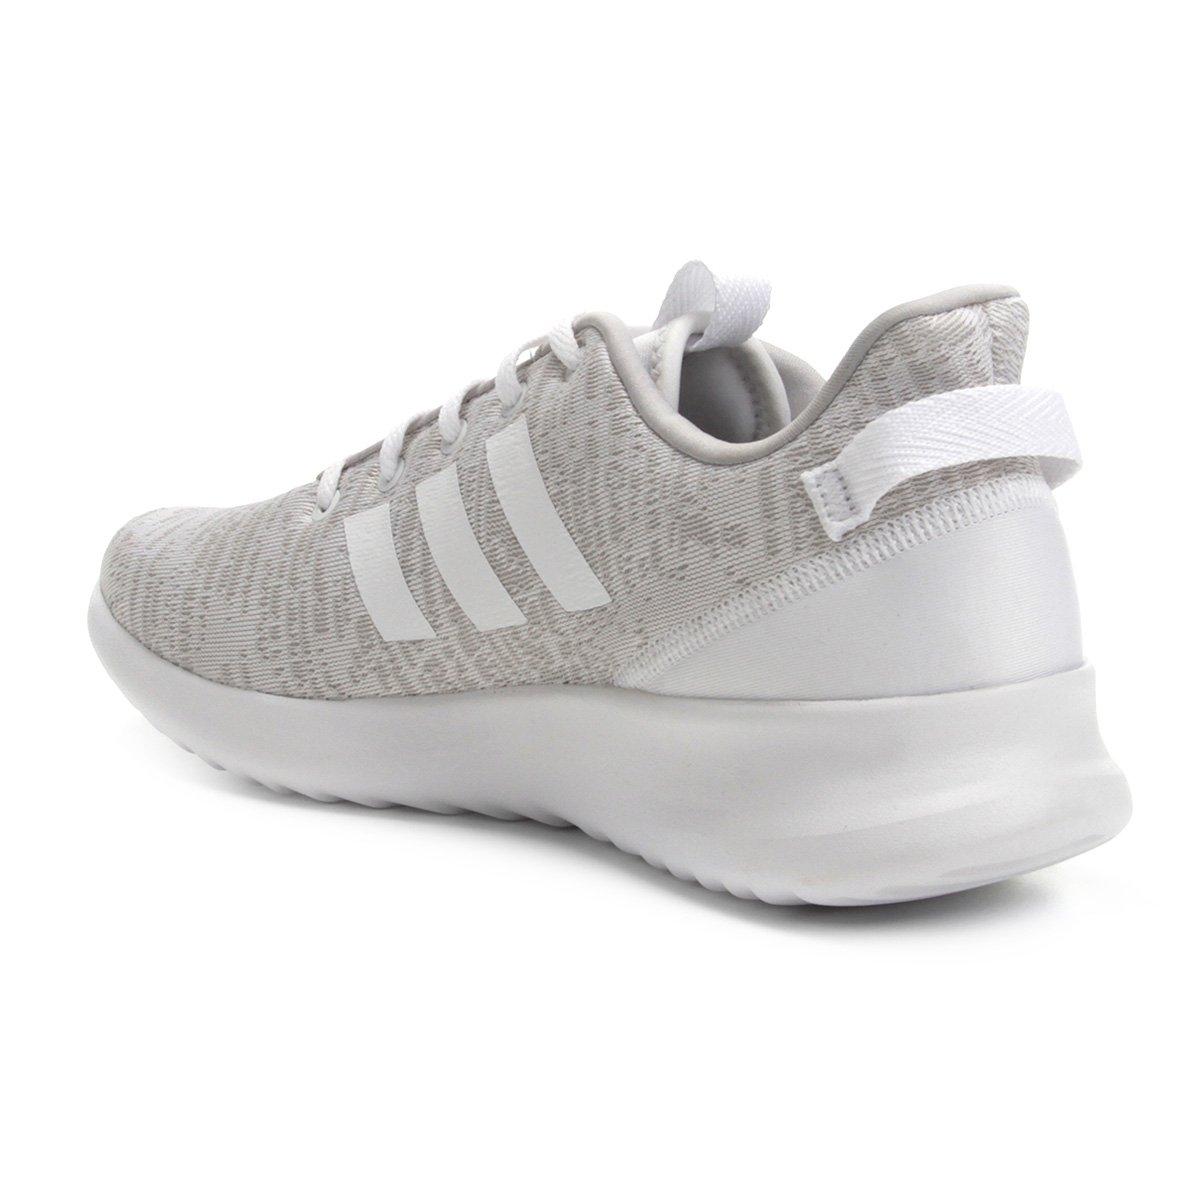 Tênis Adidas Cf Racer Tr Masculino - Branco - Compre Agora  8b0879bc4f641